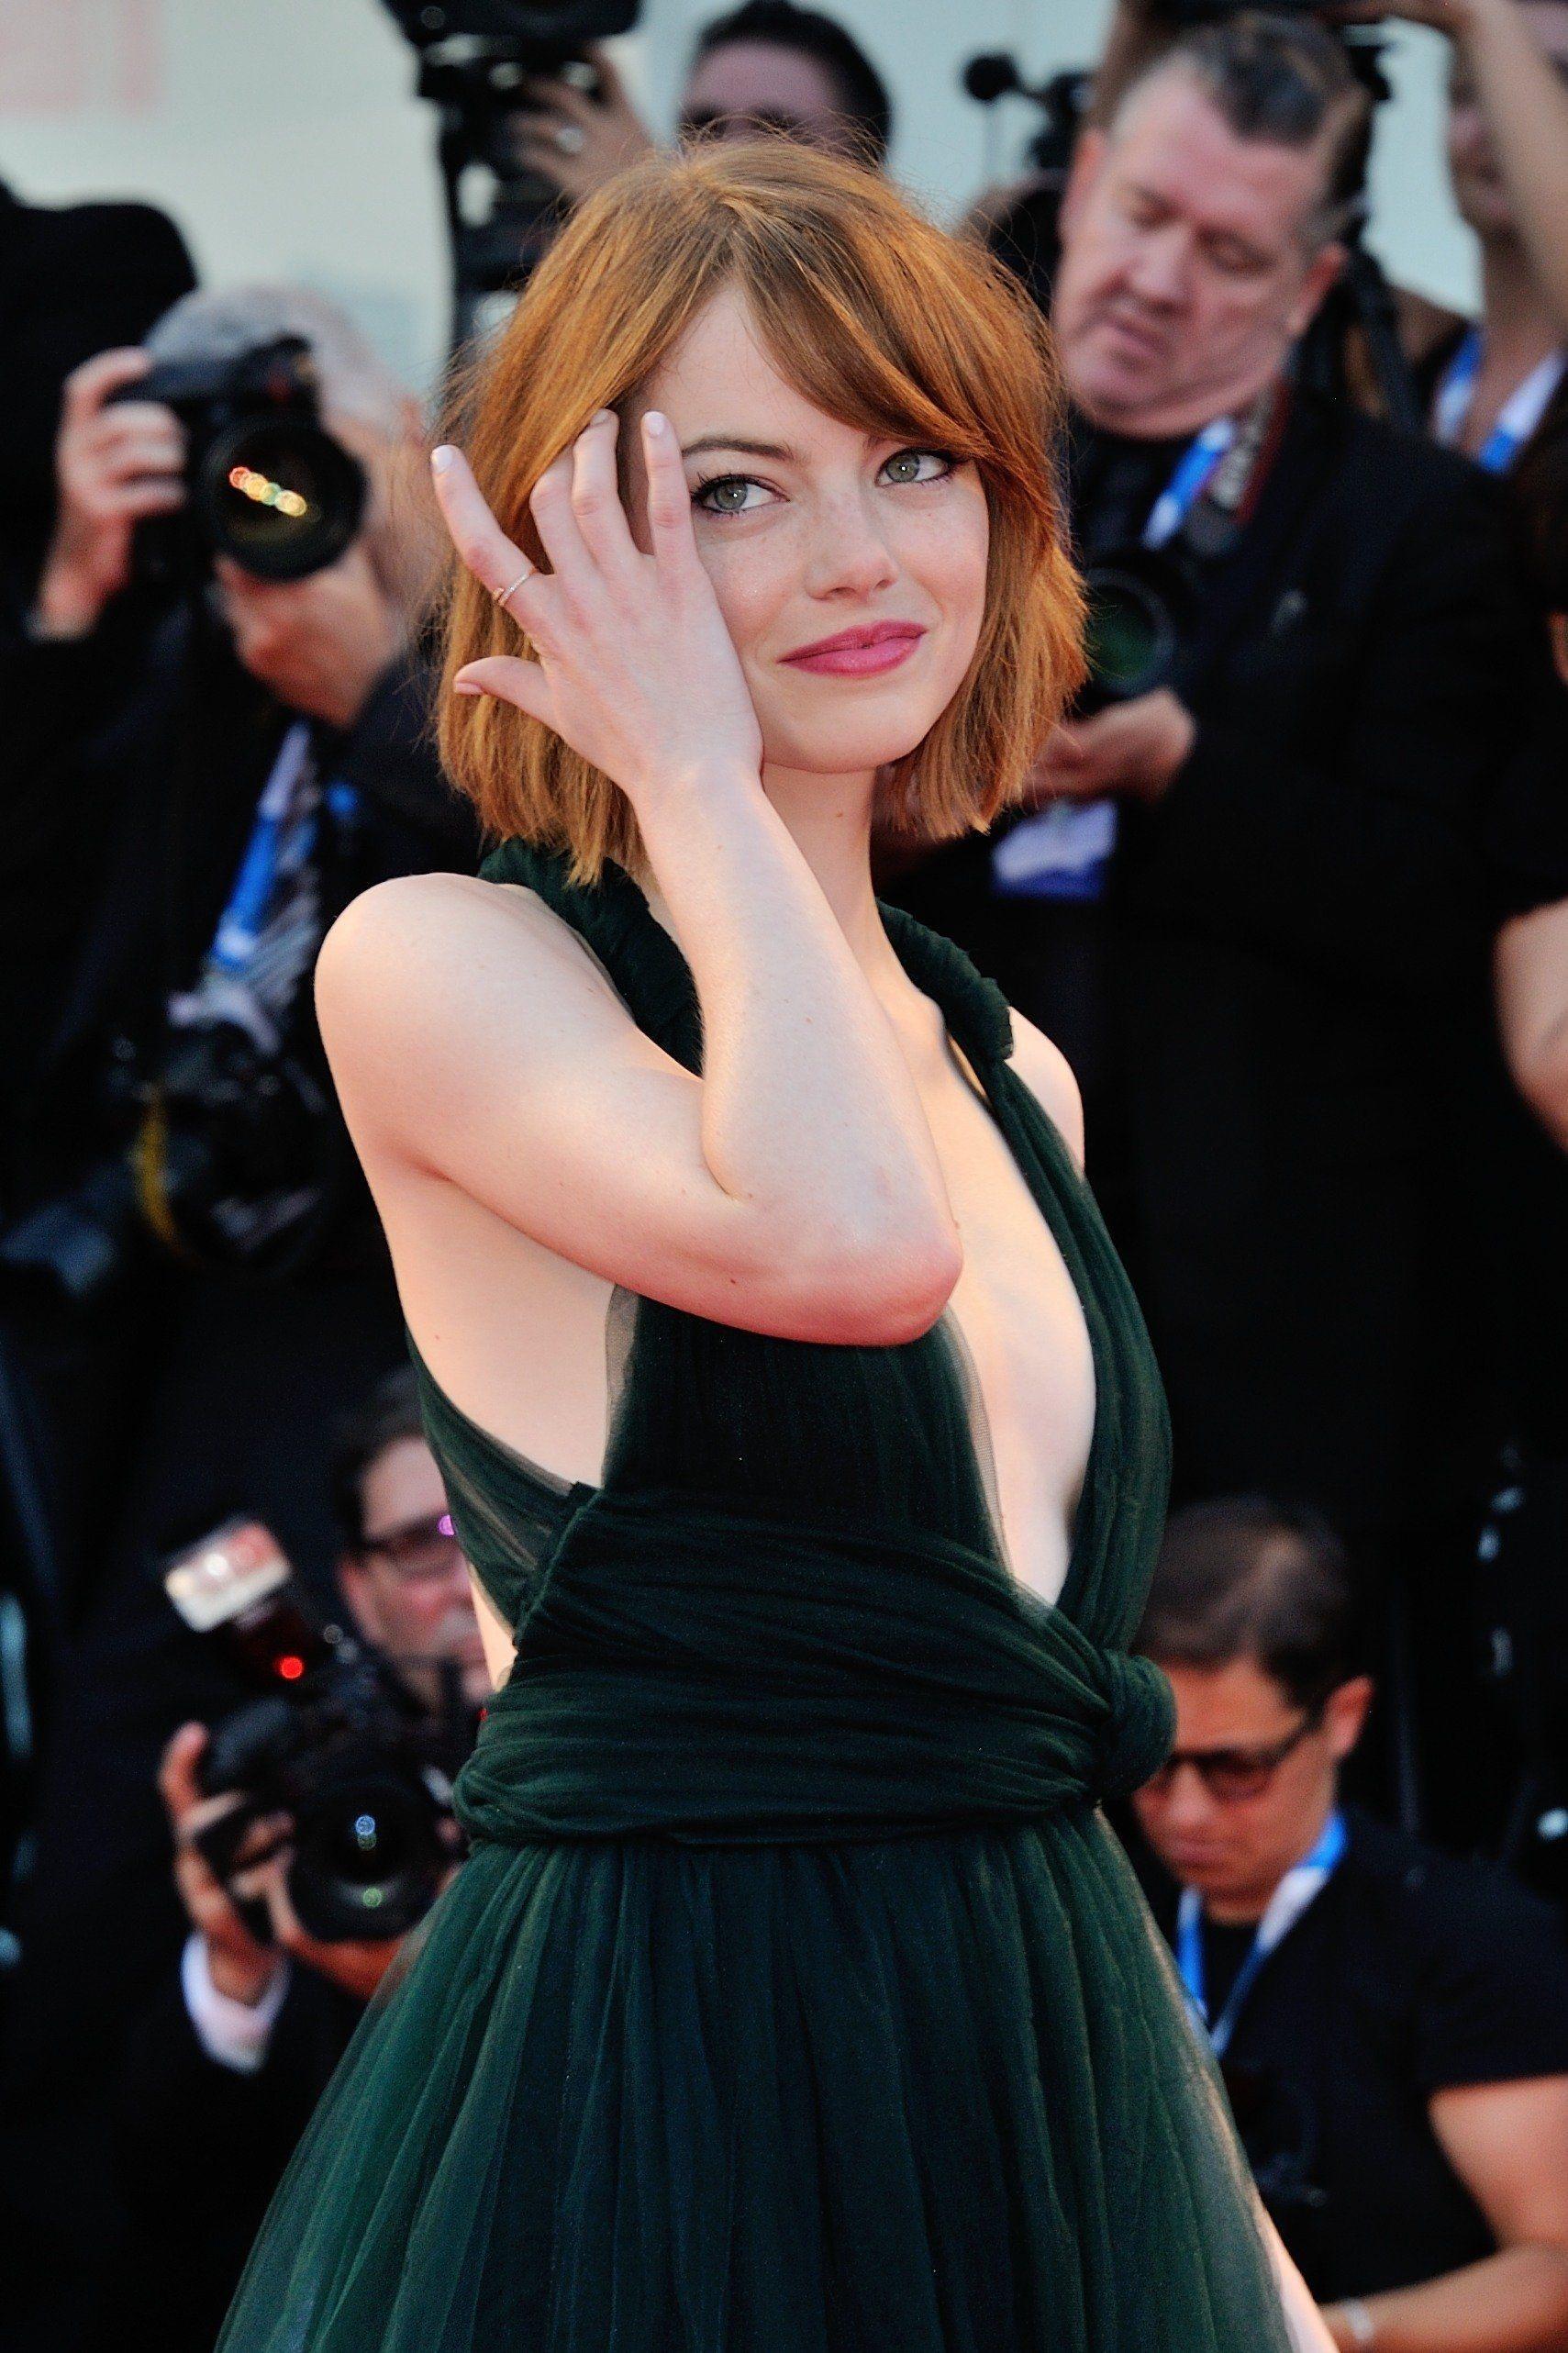 Emma Stone @ Birdman premiere opening the 71st International Venice Film Festival August 27, 2014